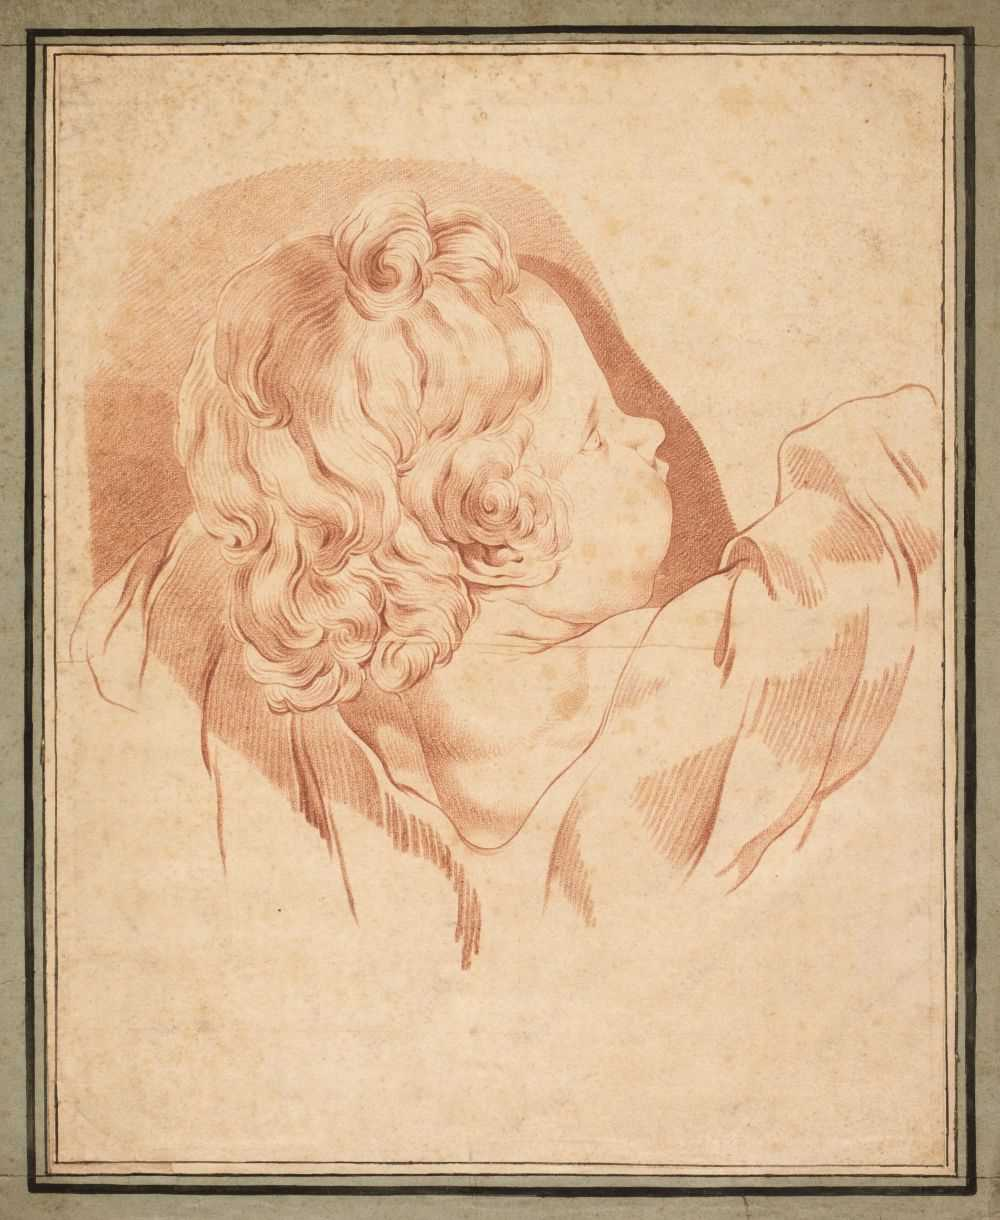 Lot 21 - Italian School. Study of a Young Boy